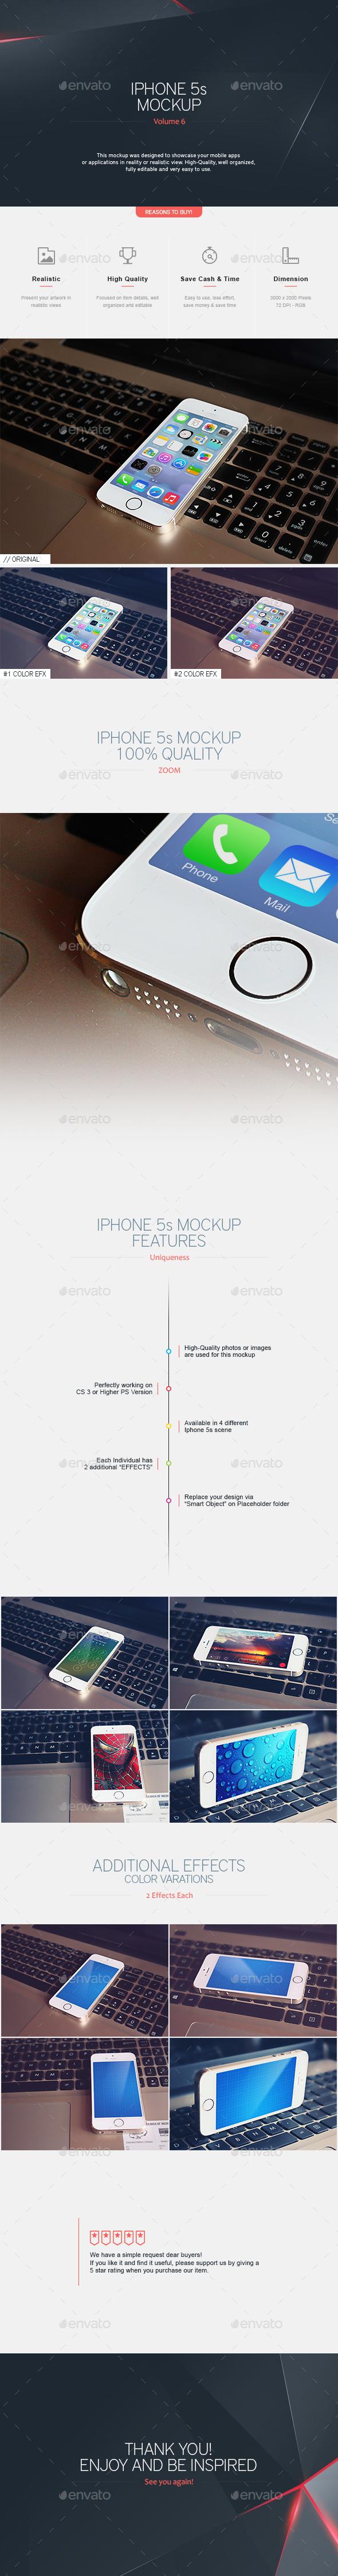 Phone 5s Mockup V.6 - Mobile Displays